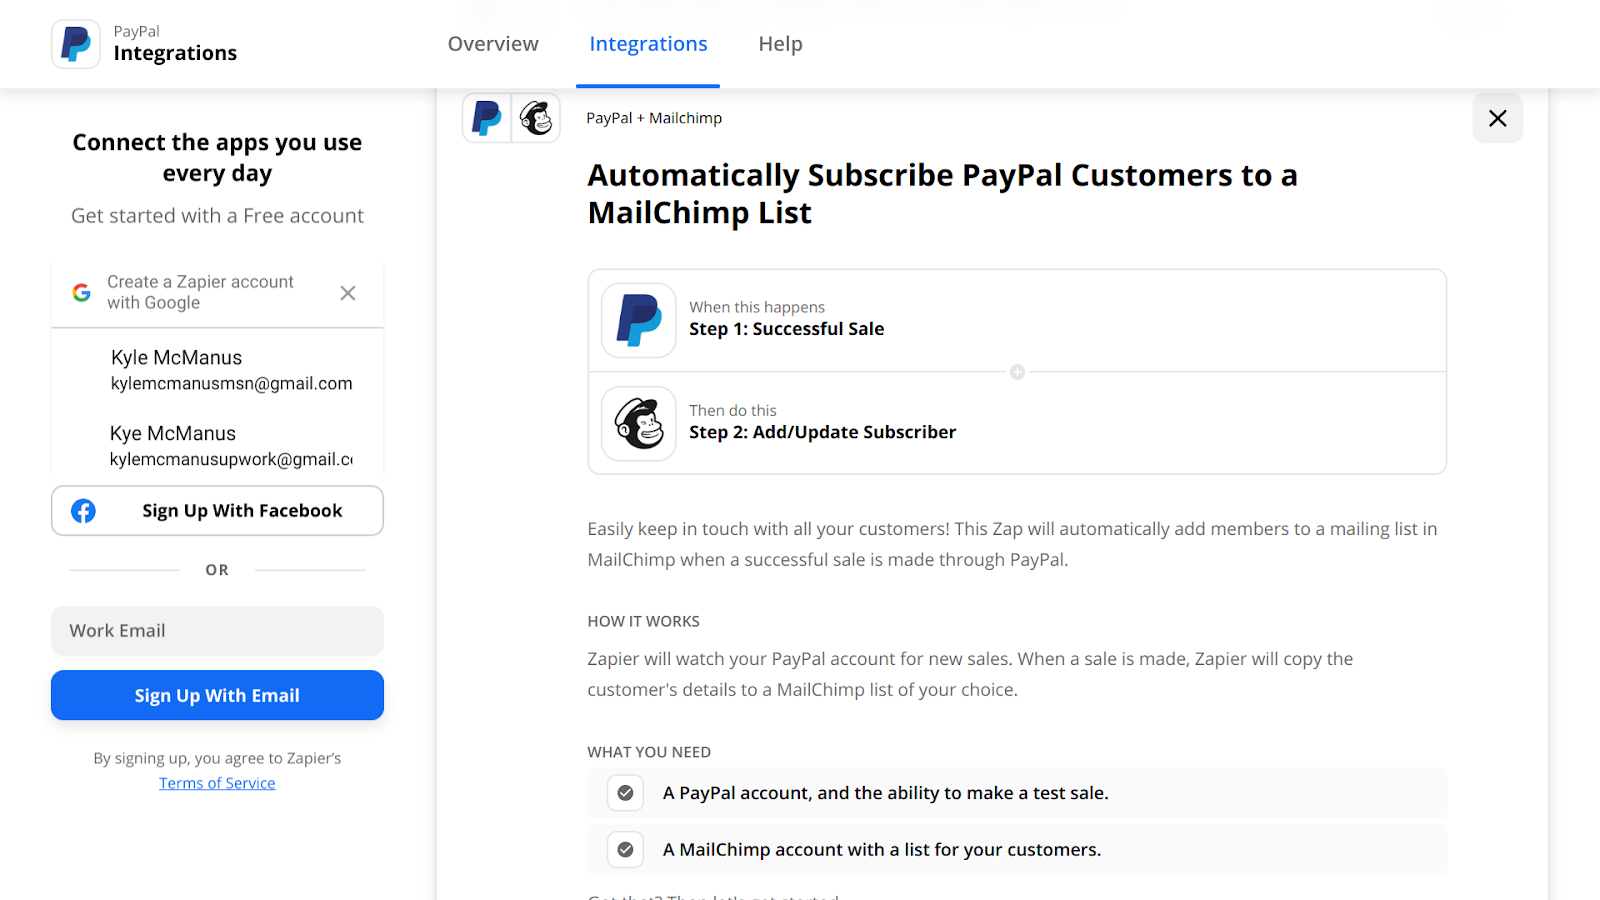 Create a PayPal + Mailchimp automation on Zapier.